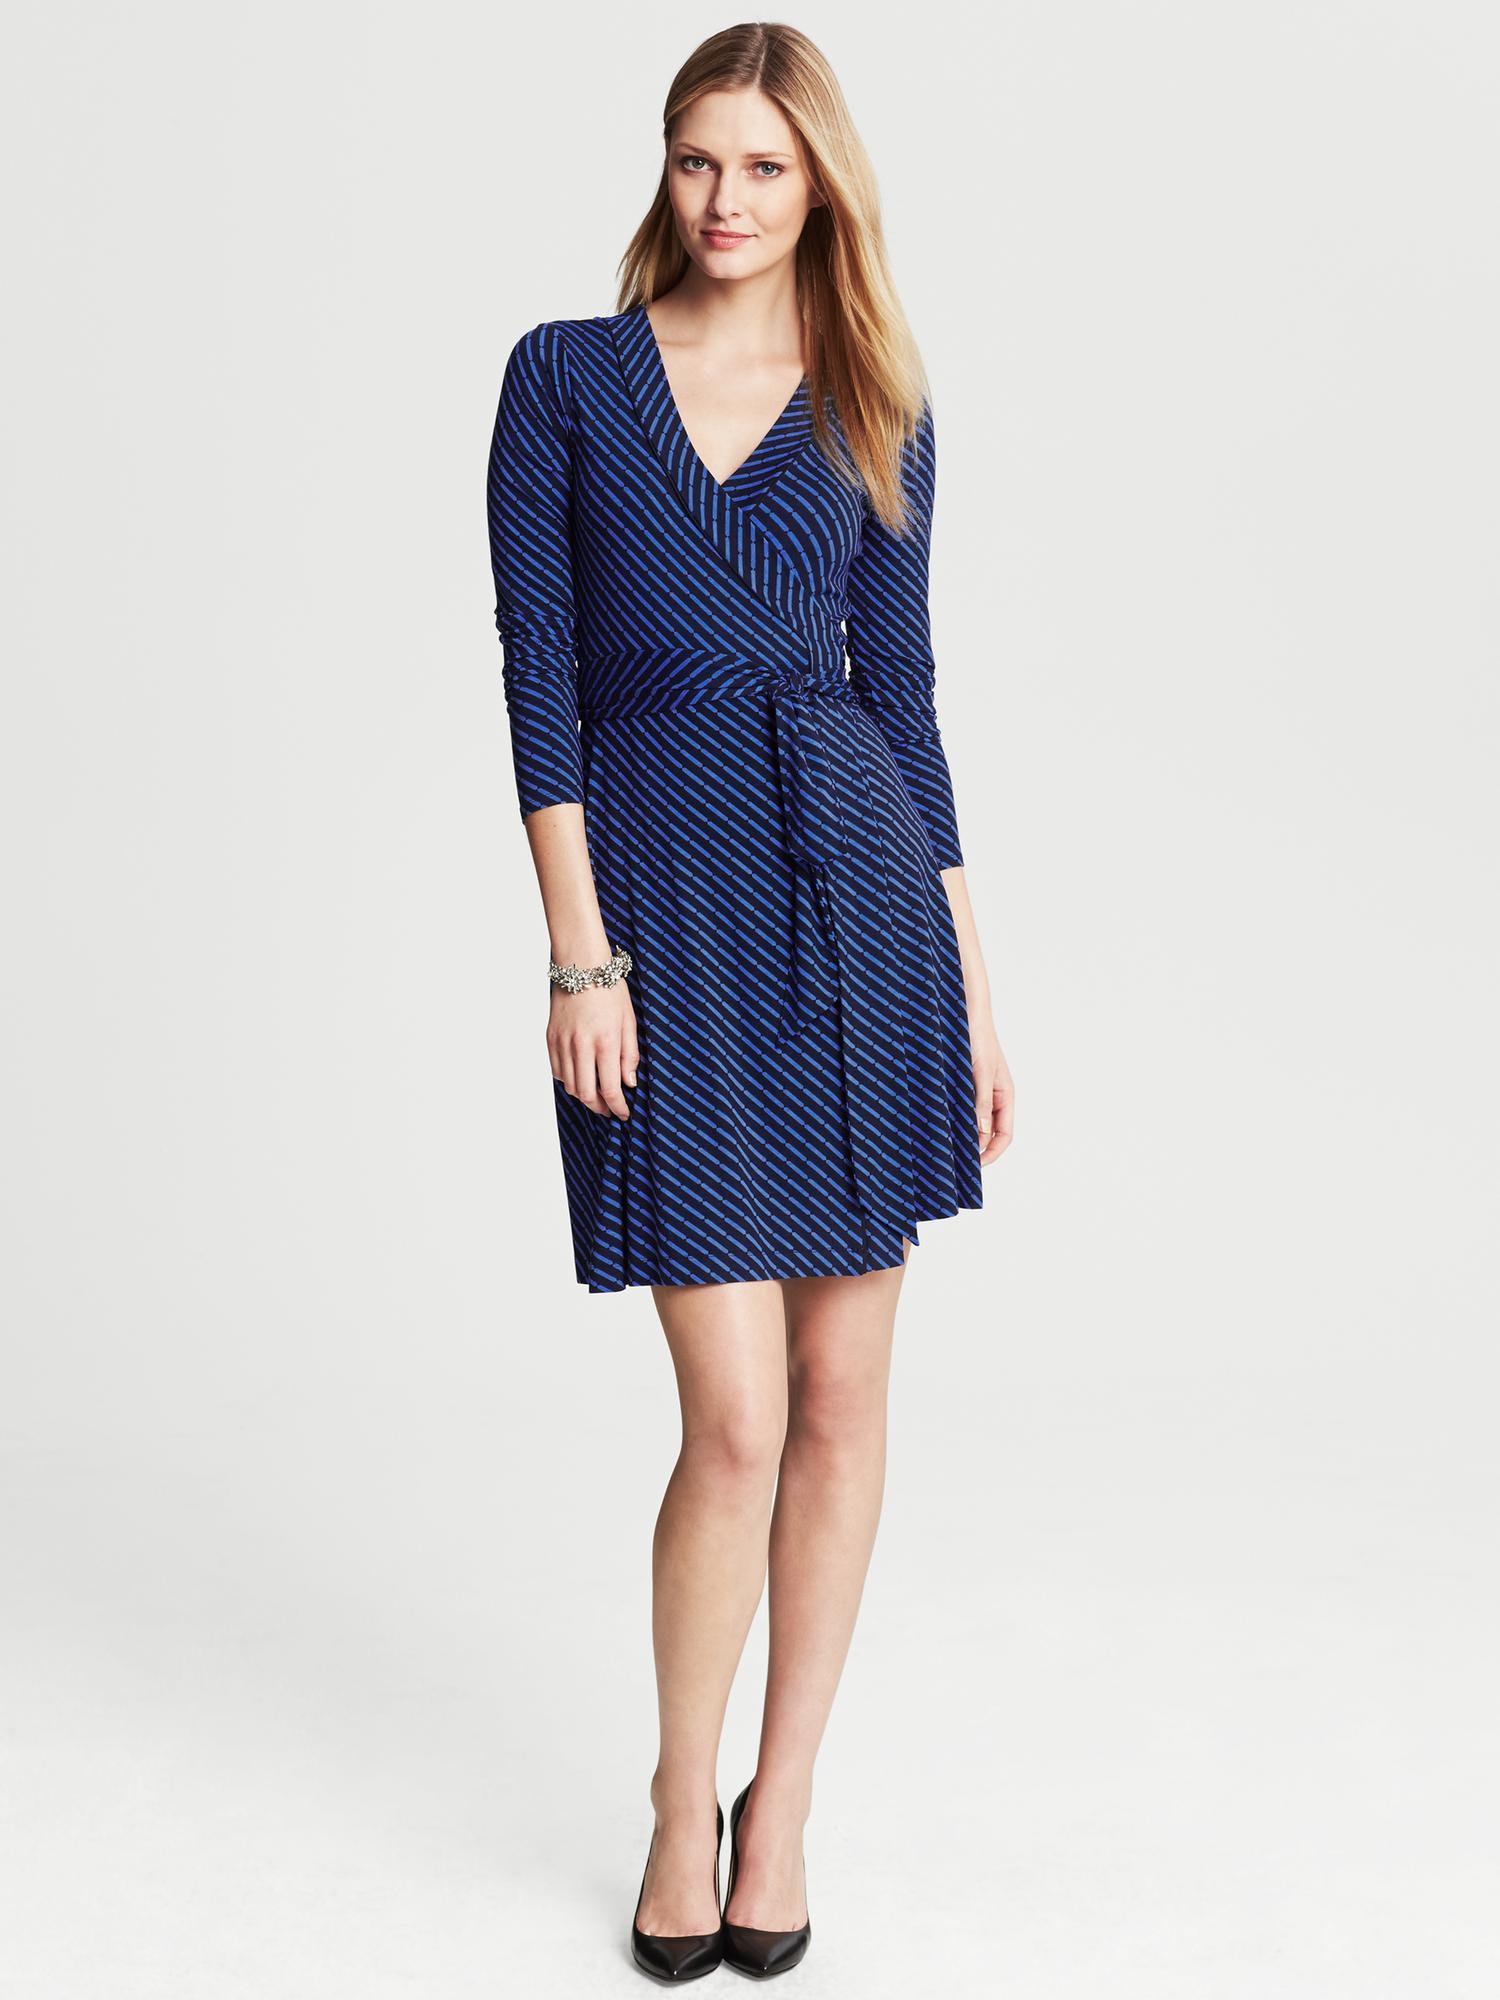 banana-republic-blue-gemma-geo-print-wrap-dress-true-navy-product-1-16335702-0-693692568-normal.jpeg